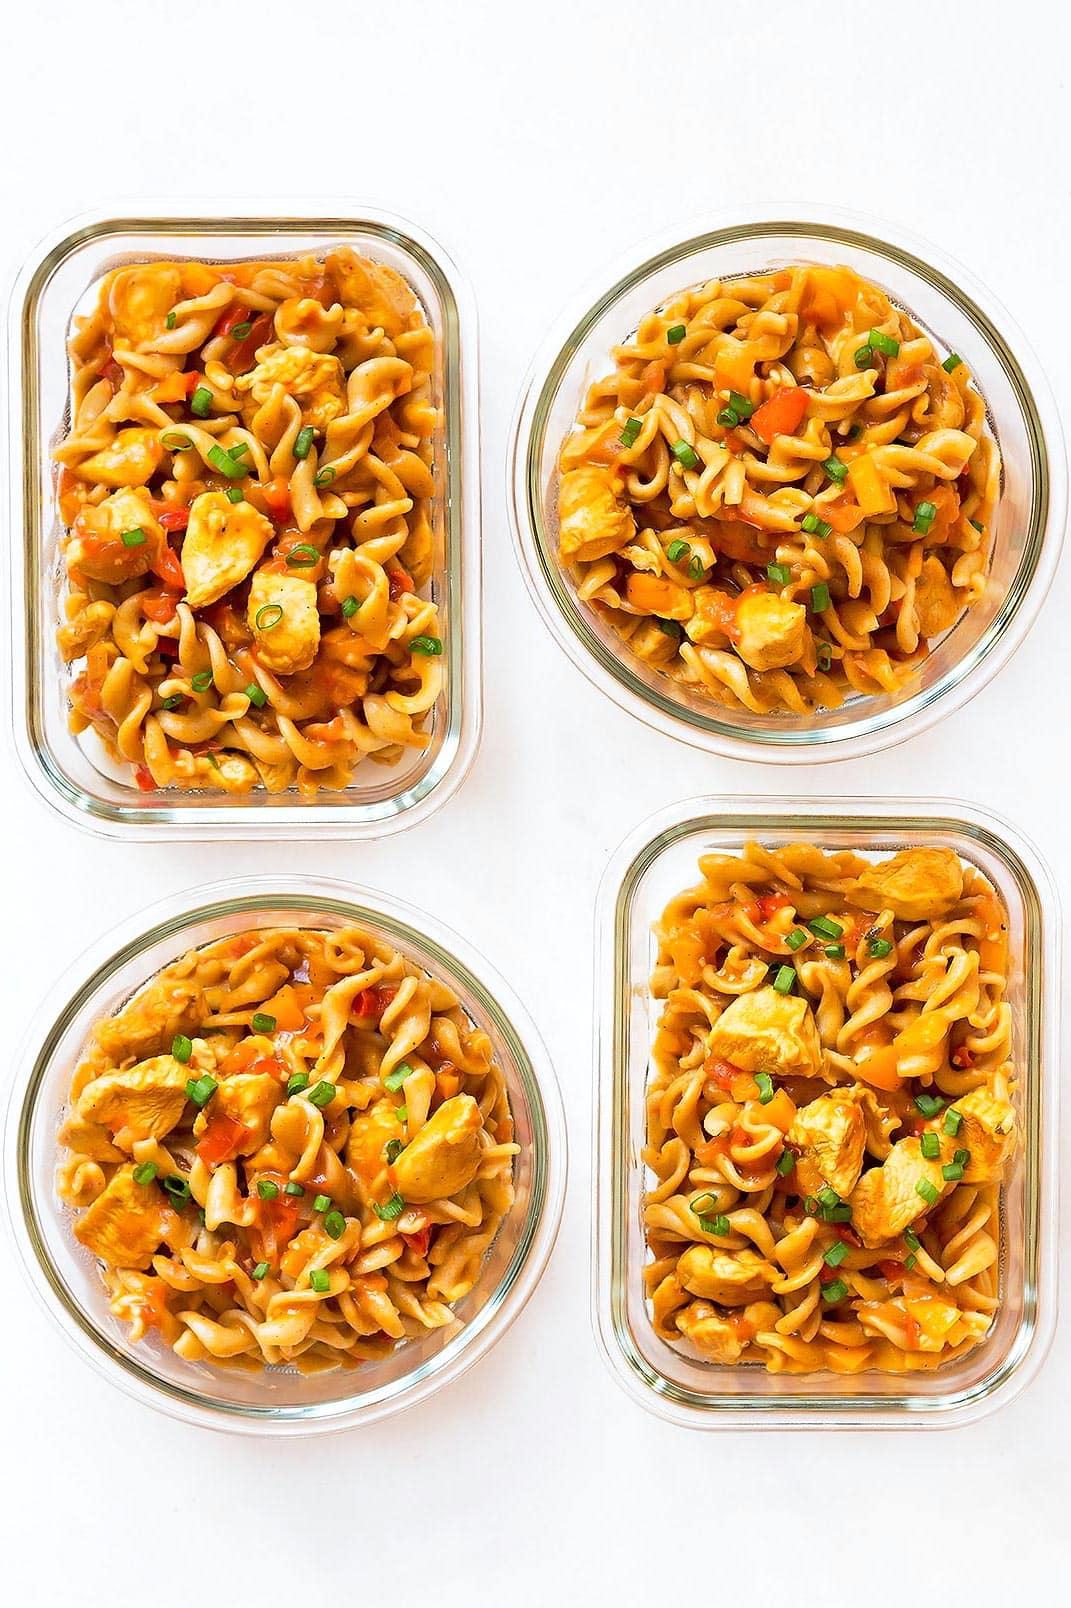 Cajun Chicken Pasta in Containers